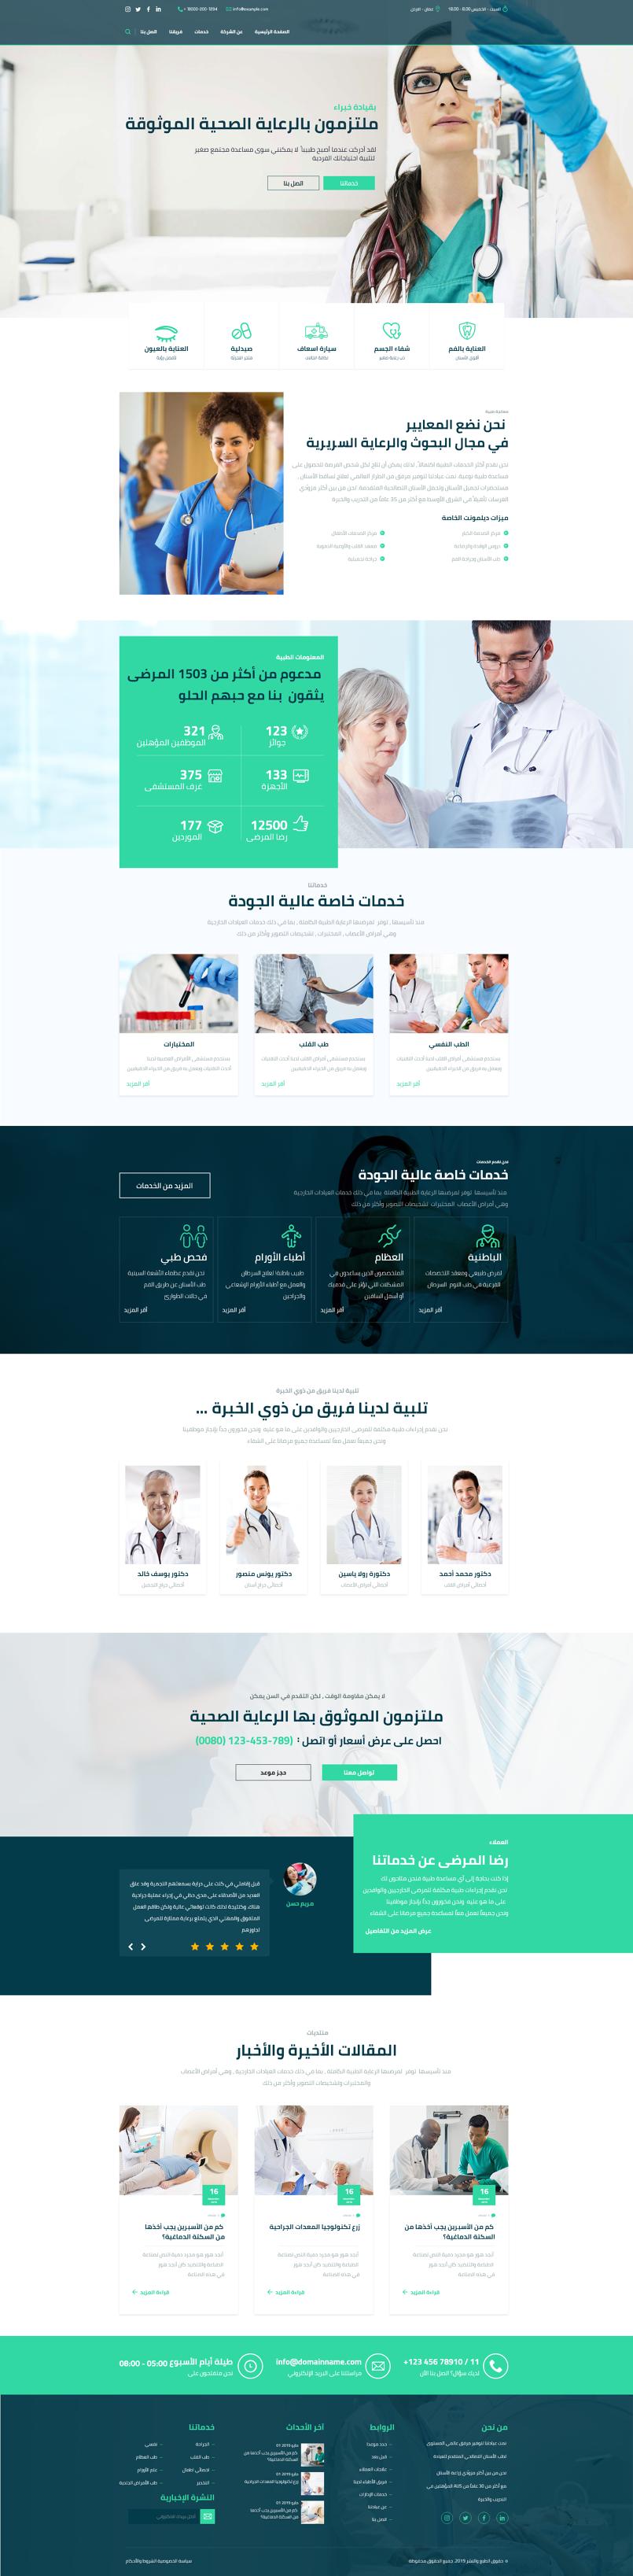 Medical & Health